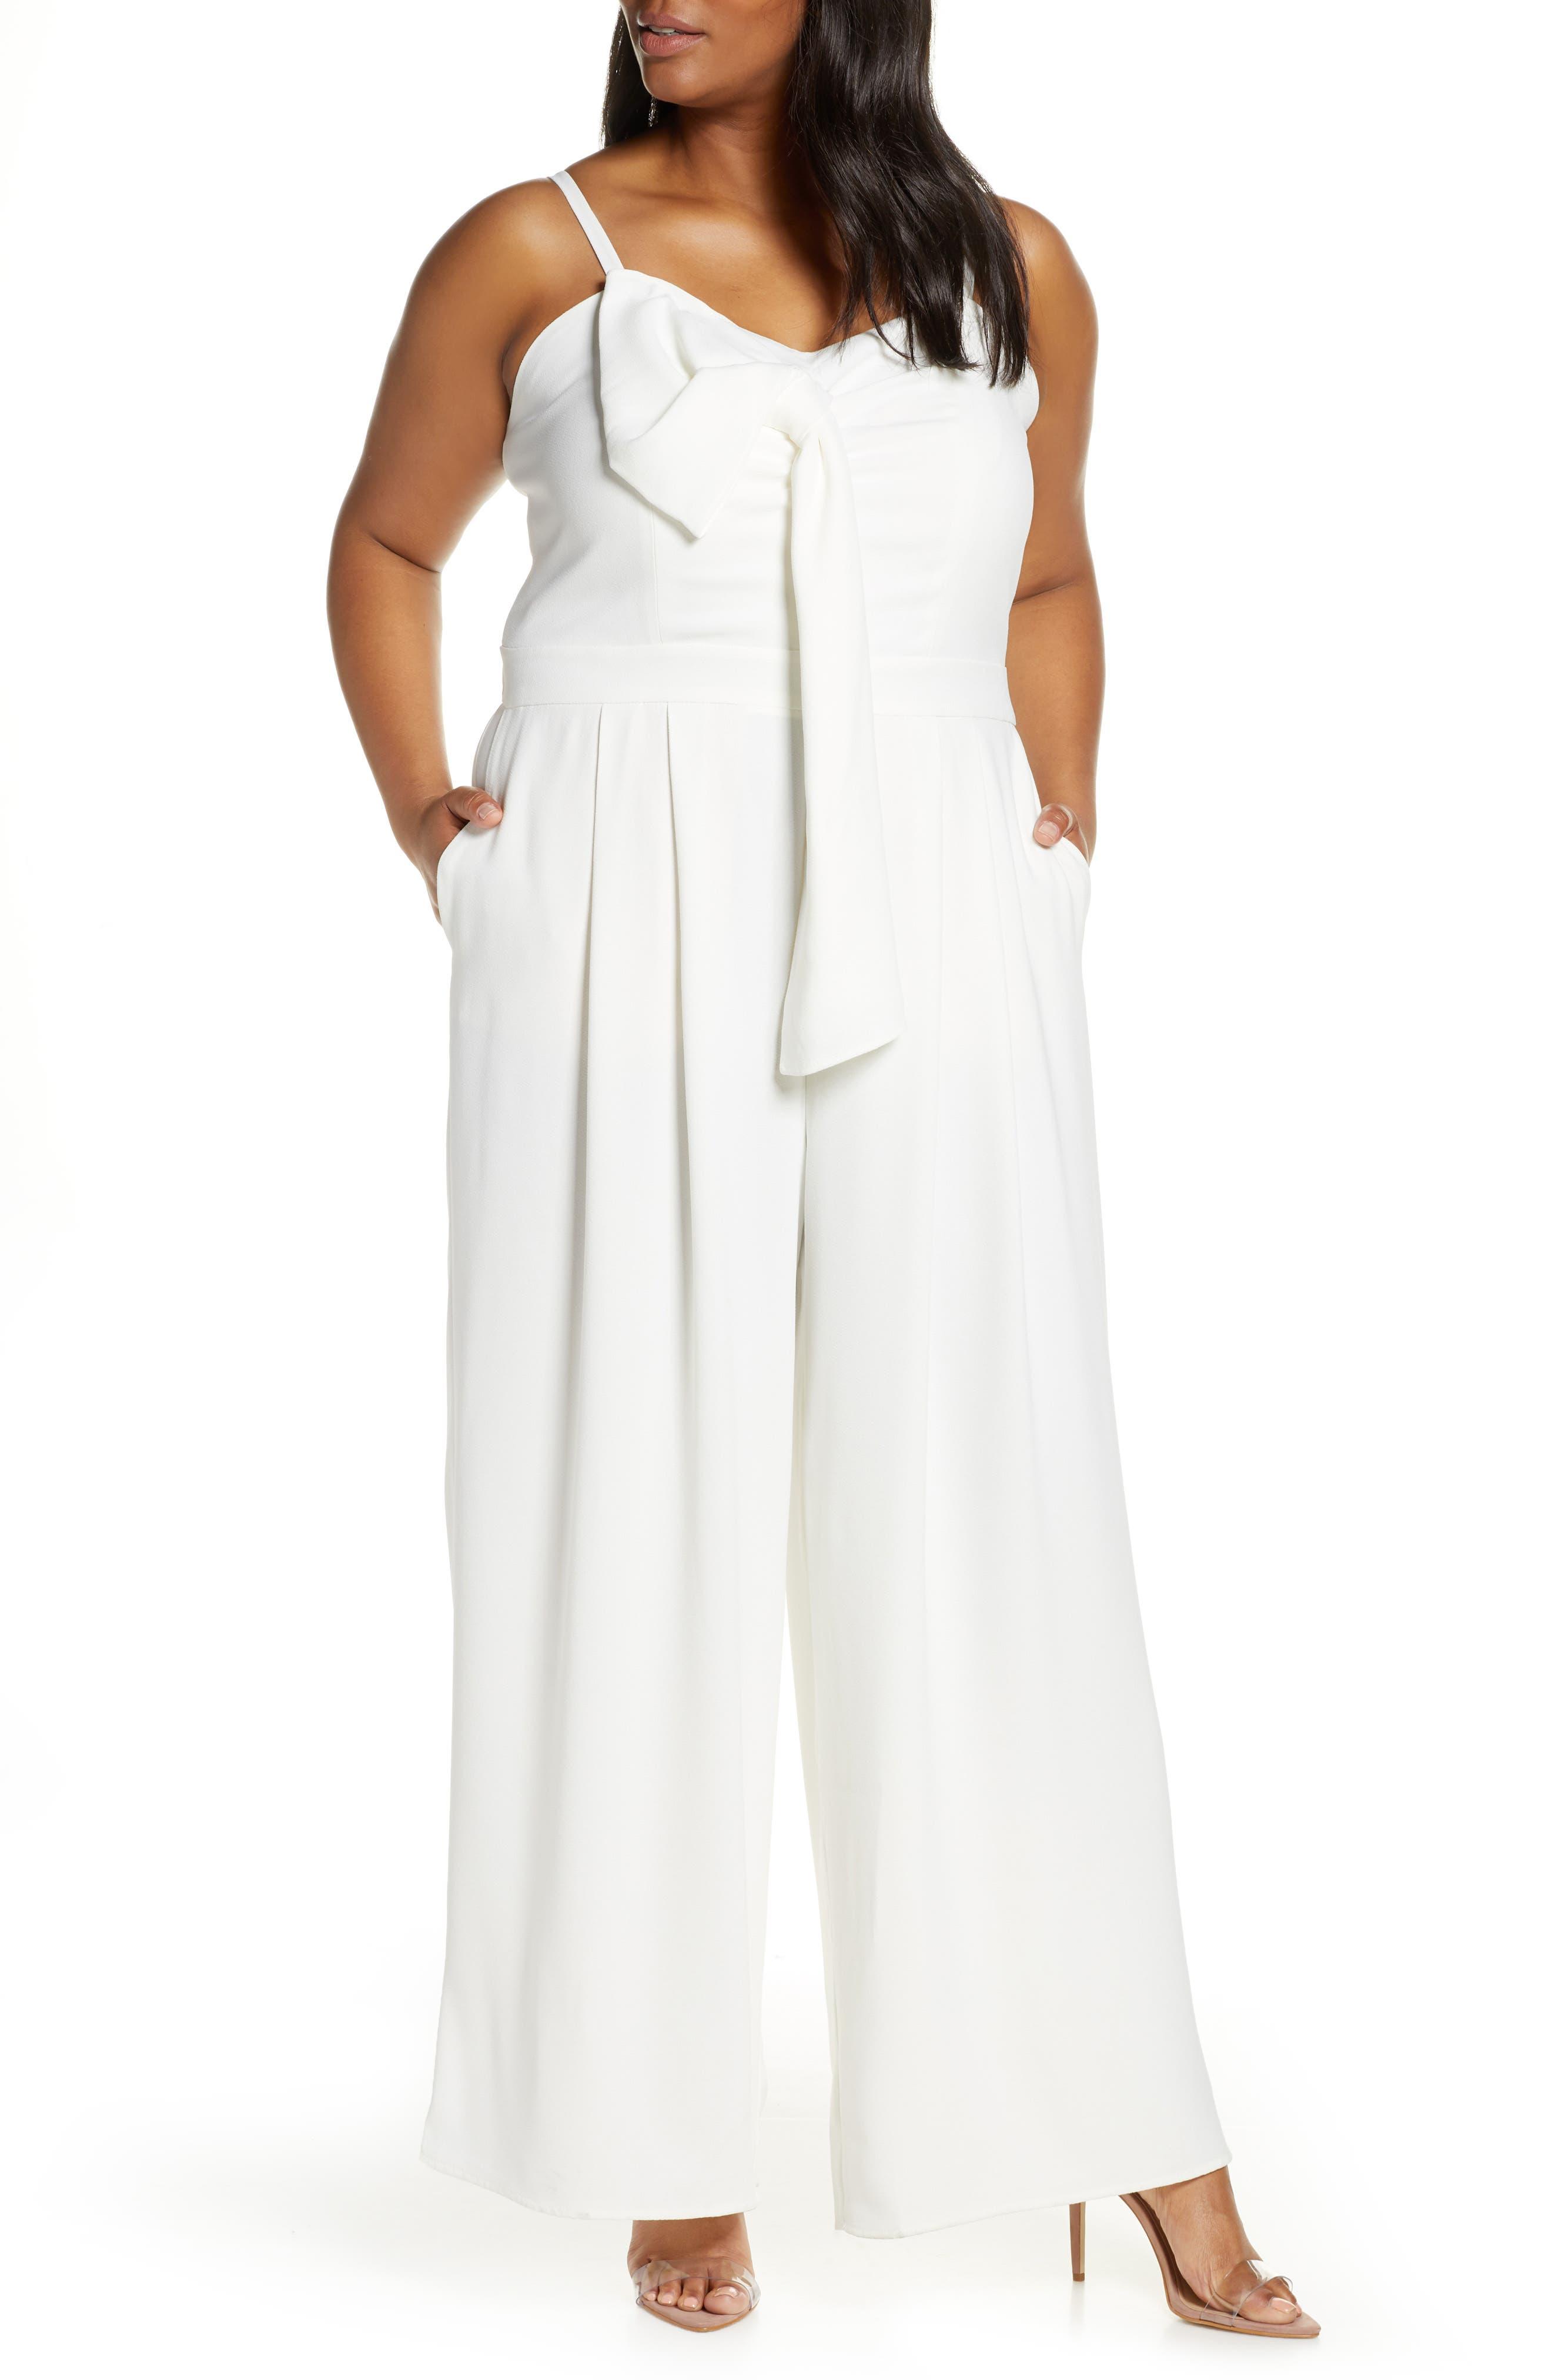 8fdea8a94fe Jumpsuits & Rompers Plus-Size Dresses | Nordstrom